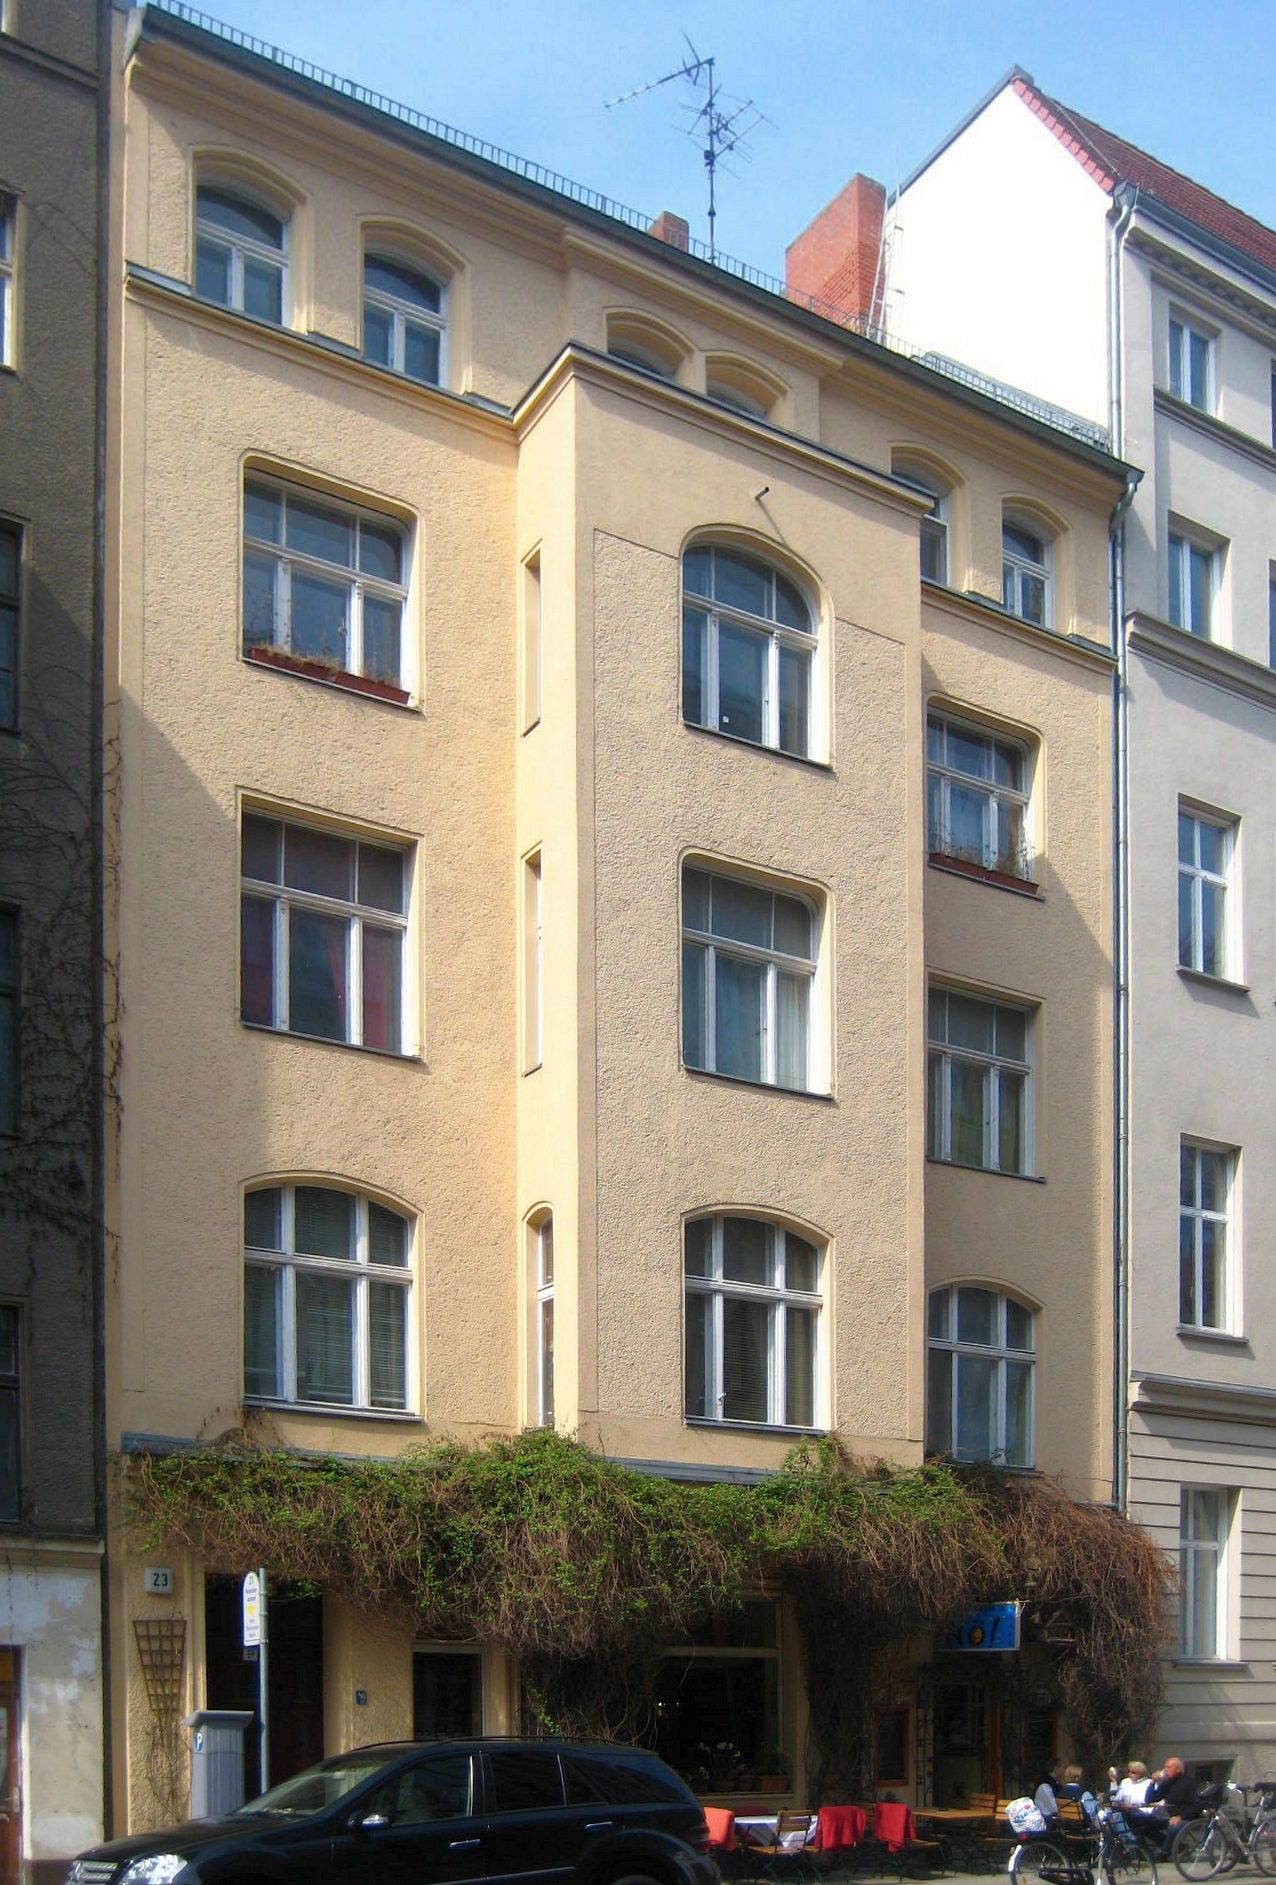 Fileberlin mitte glinkastrasse 23 mietshaus jpg wikimedia